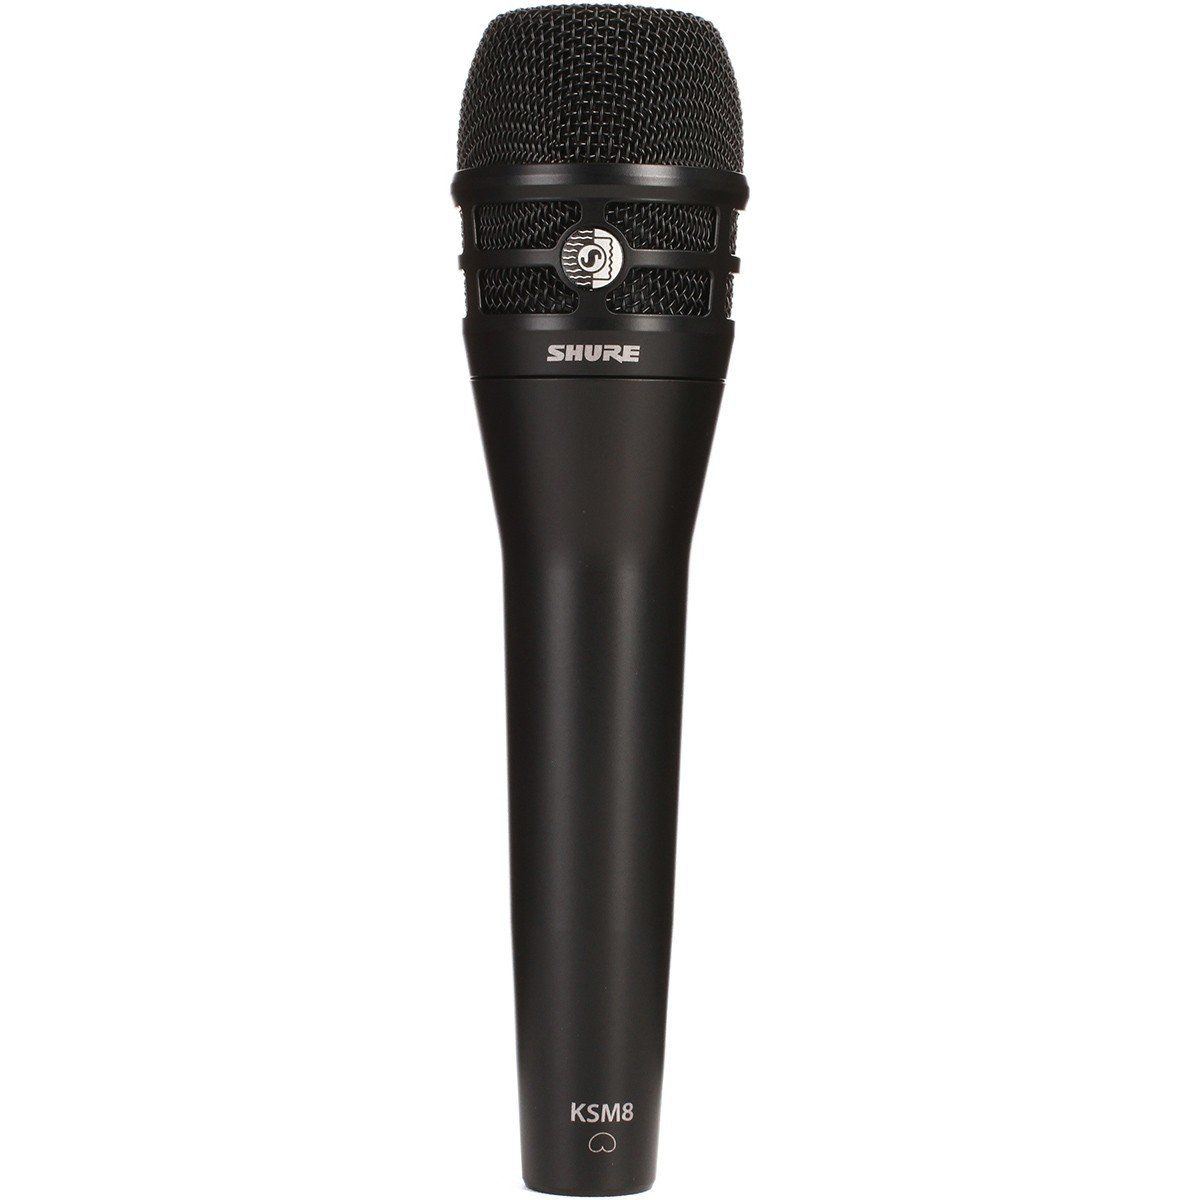 Shure KSM8 Microfone Dinâmico Cardioide Shure-KSM8 para Performances de Voz